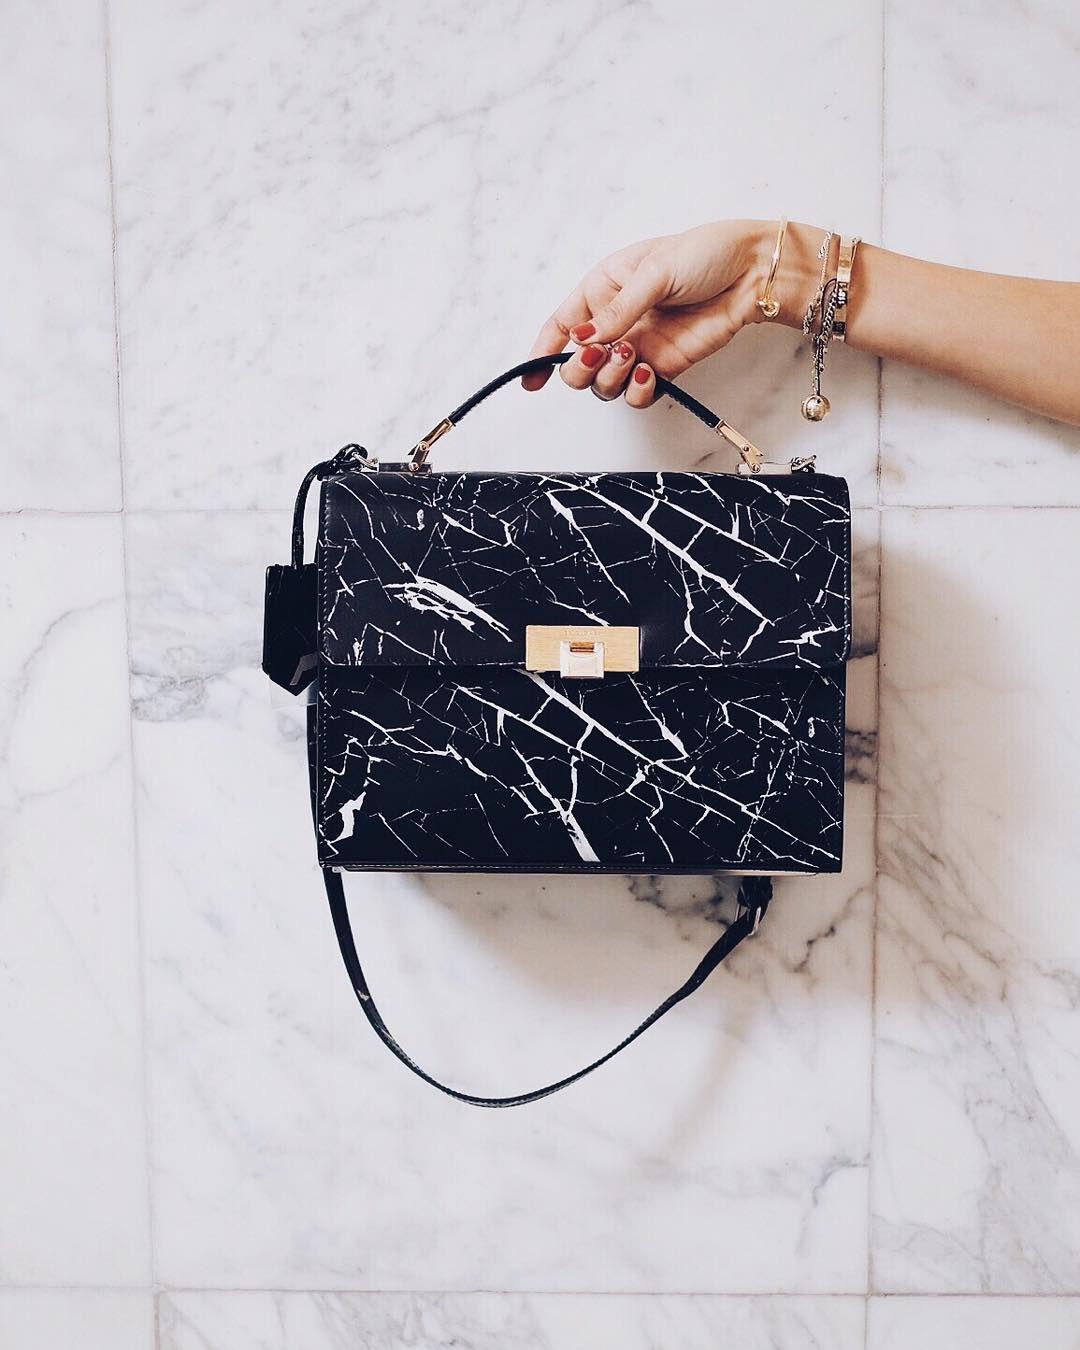 Balenciaga Marble Bag Newin Favorite Want Inlove